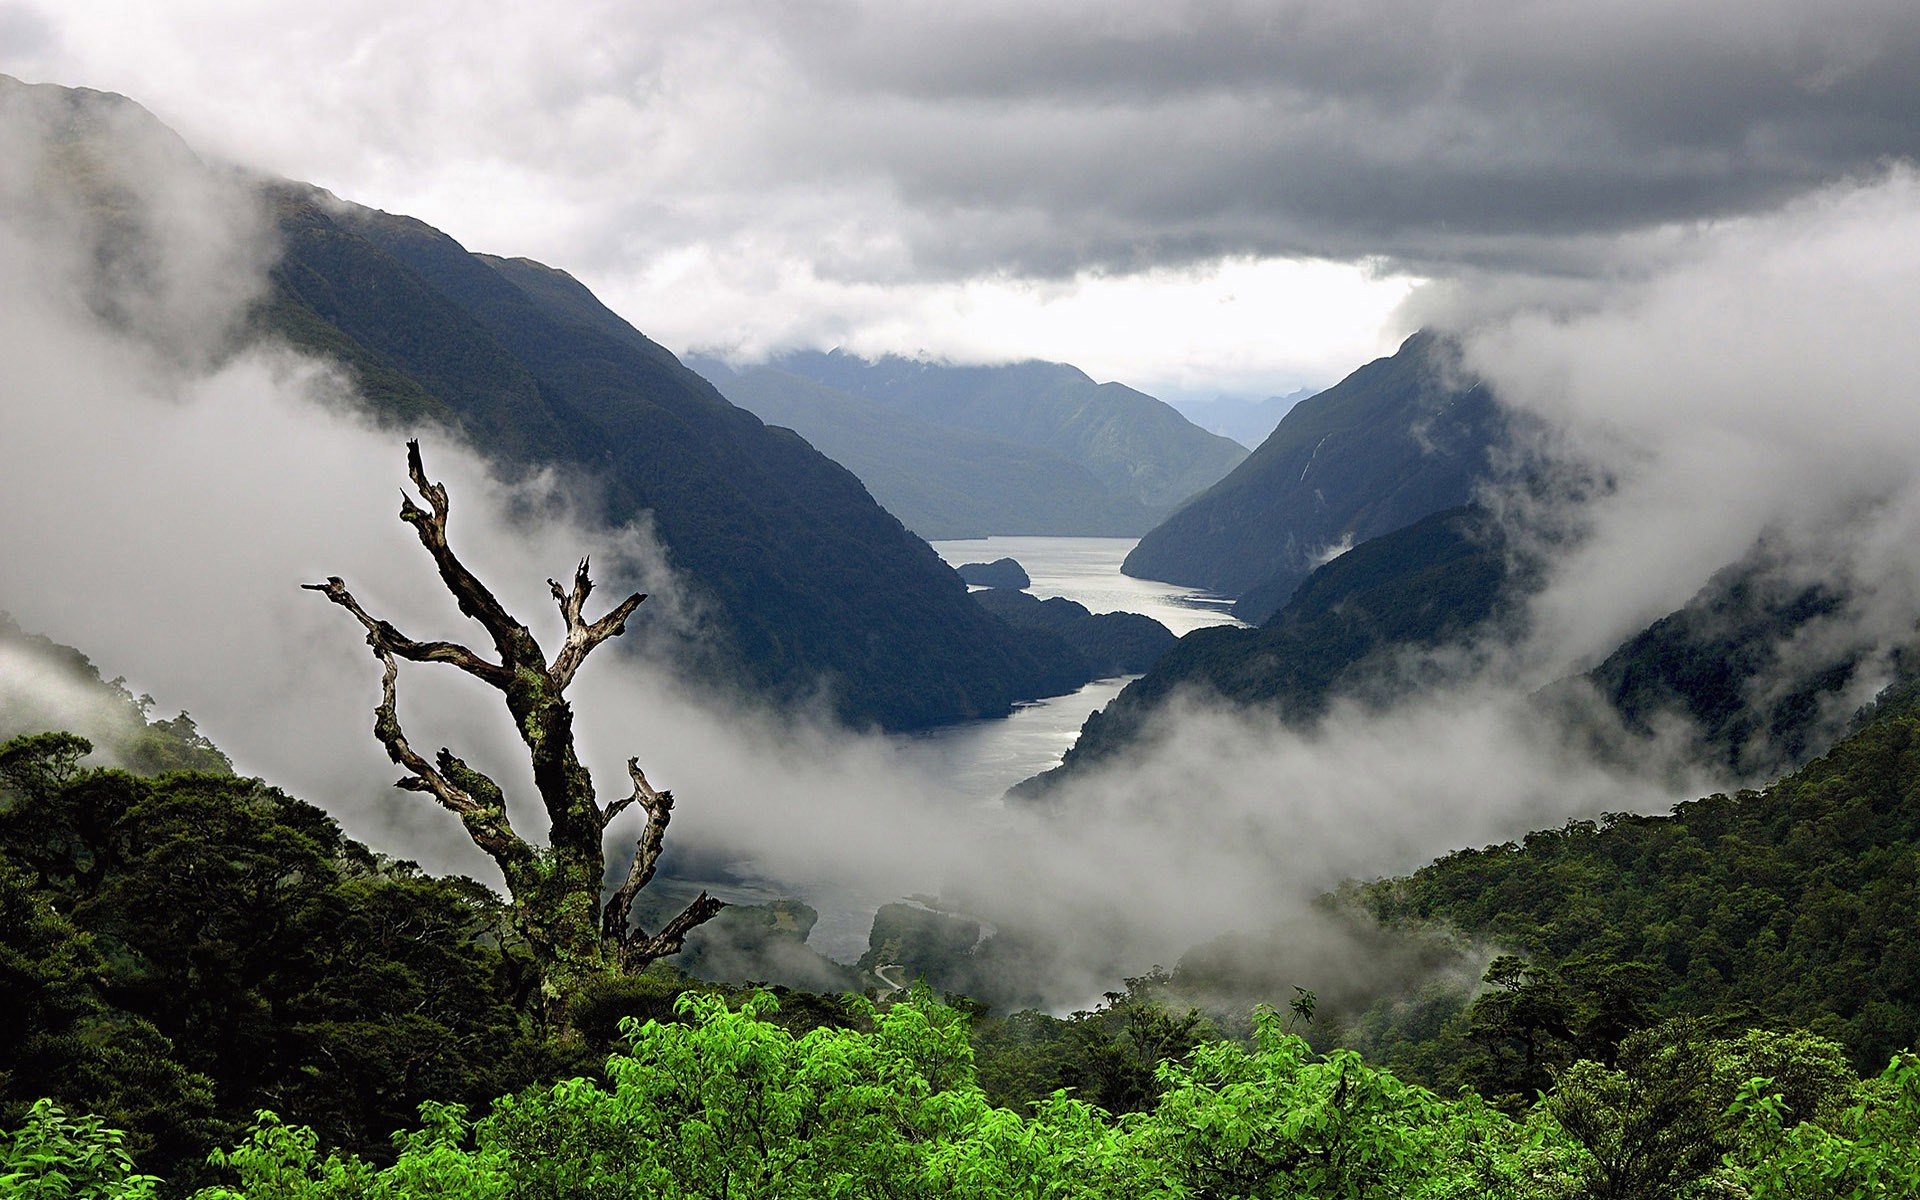 nature, Landscape, Mountain, Mist, Clouds, Sea Wallpapers ...